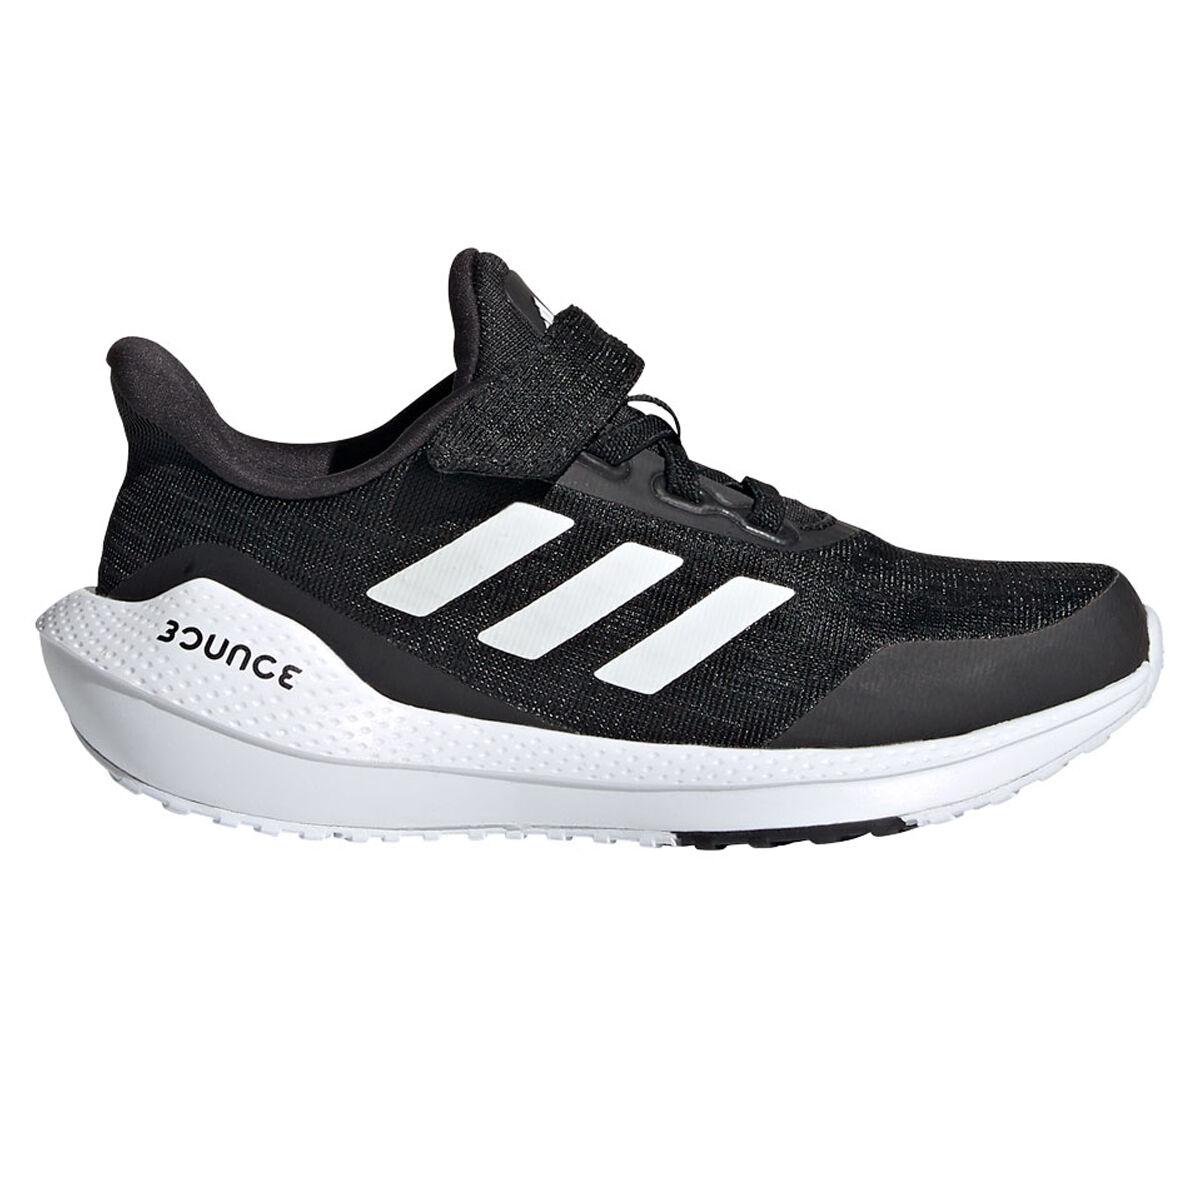 adidas originals camo tights for women | adidas EQ21 Run Kids Running Shoes